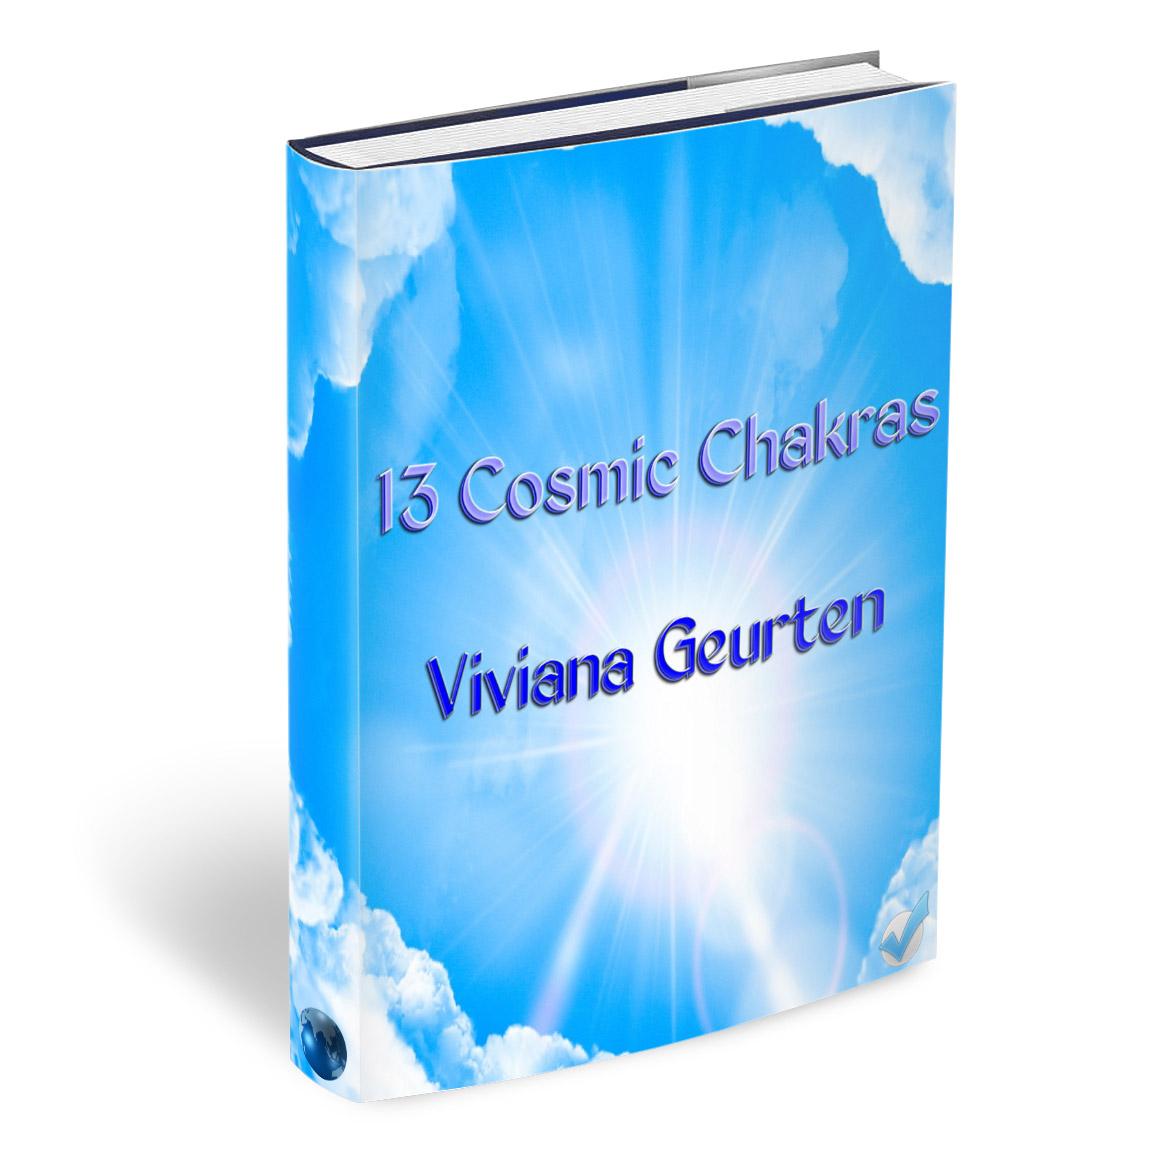 13-Cosmic-Chakras-Viviana-Geurten